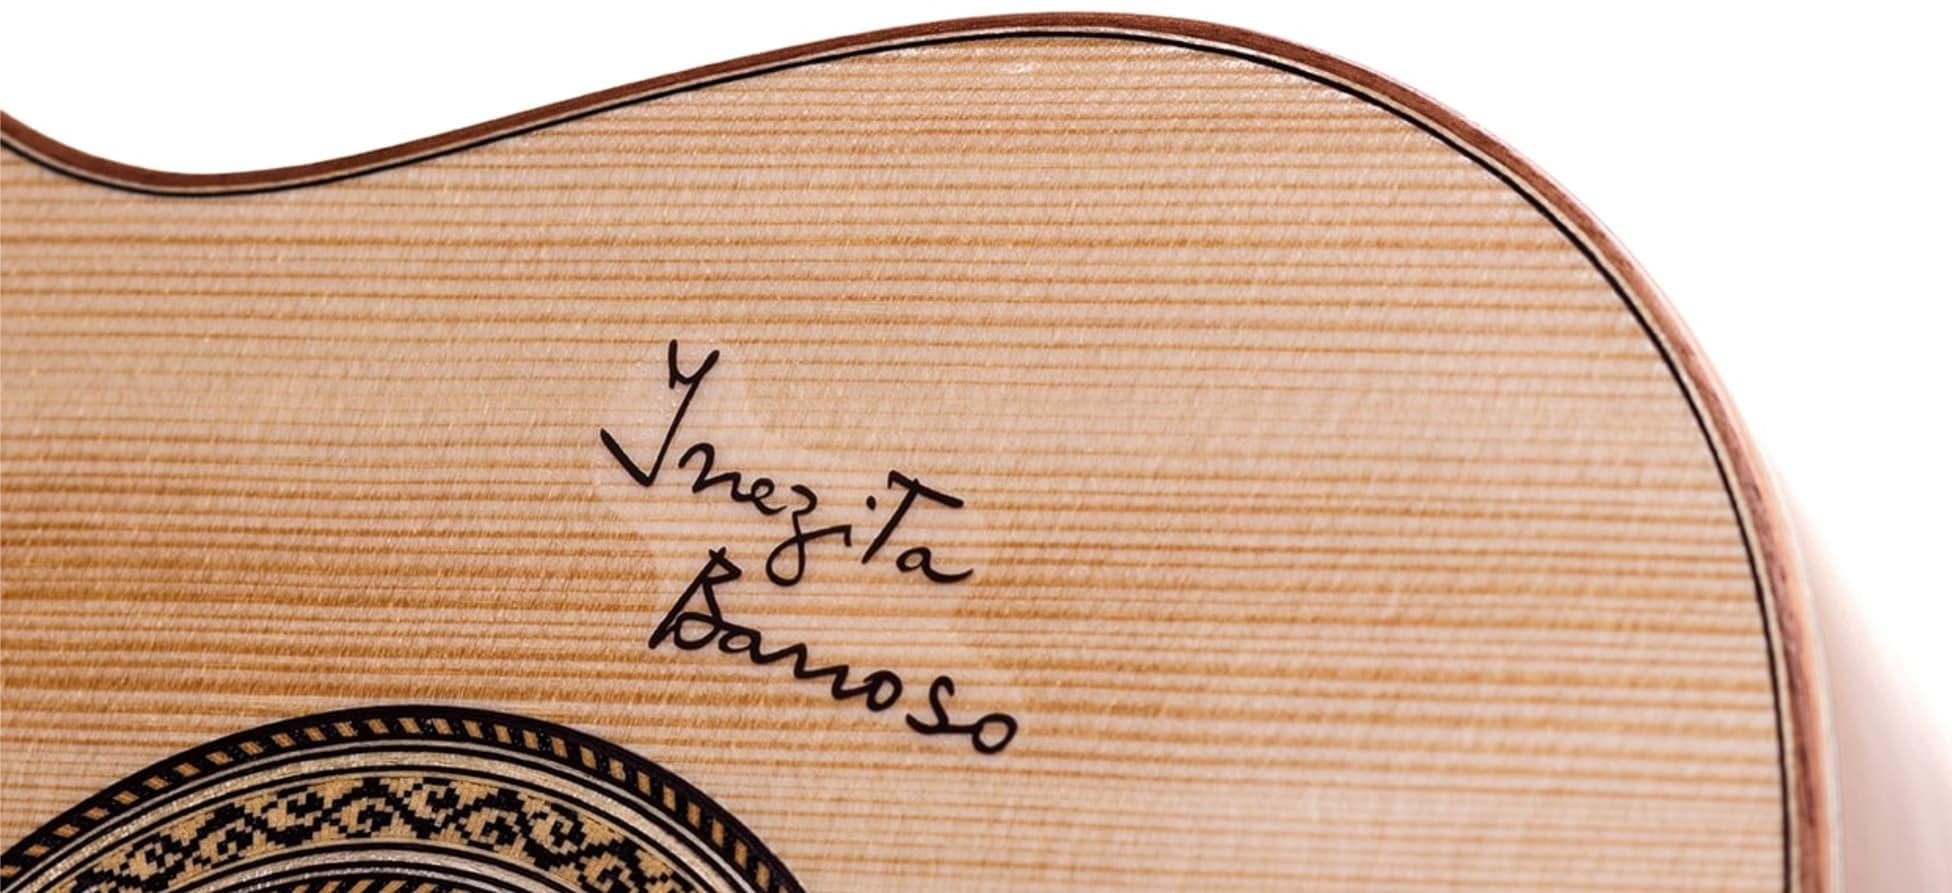 Viola Caipira Rozini Rv192 Atnib Inezita Barroso Elétrica Natural Brilhante